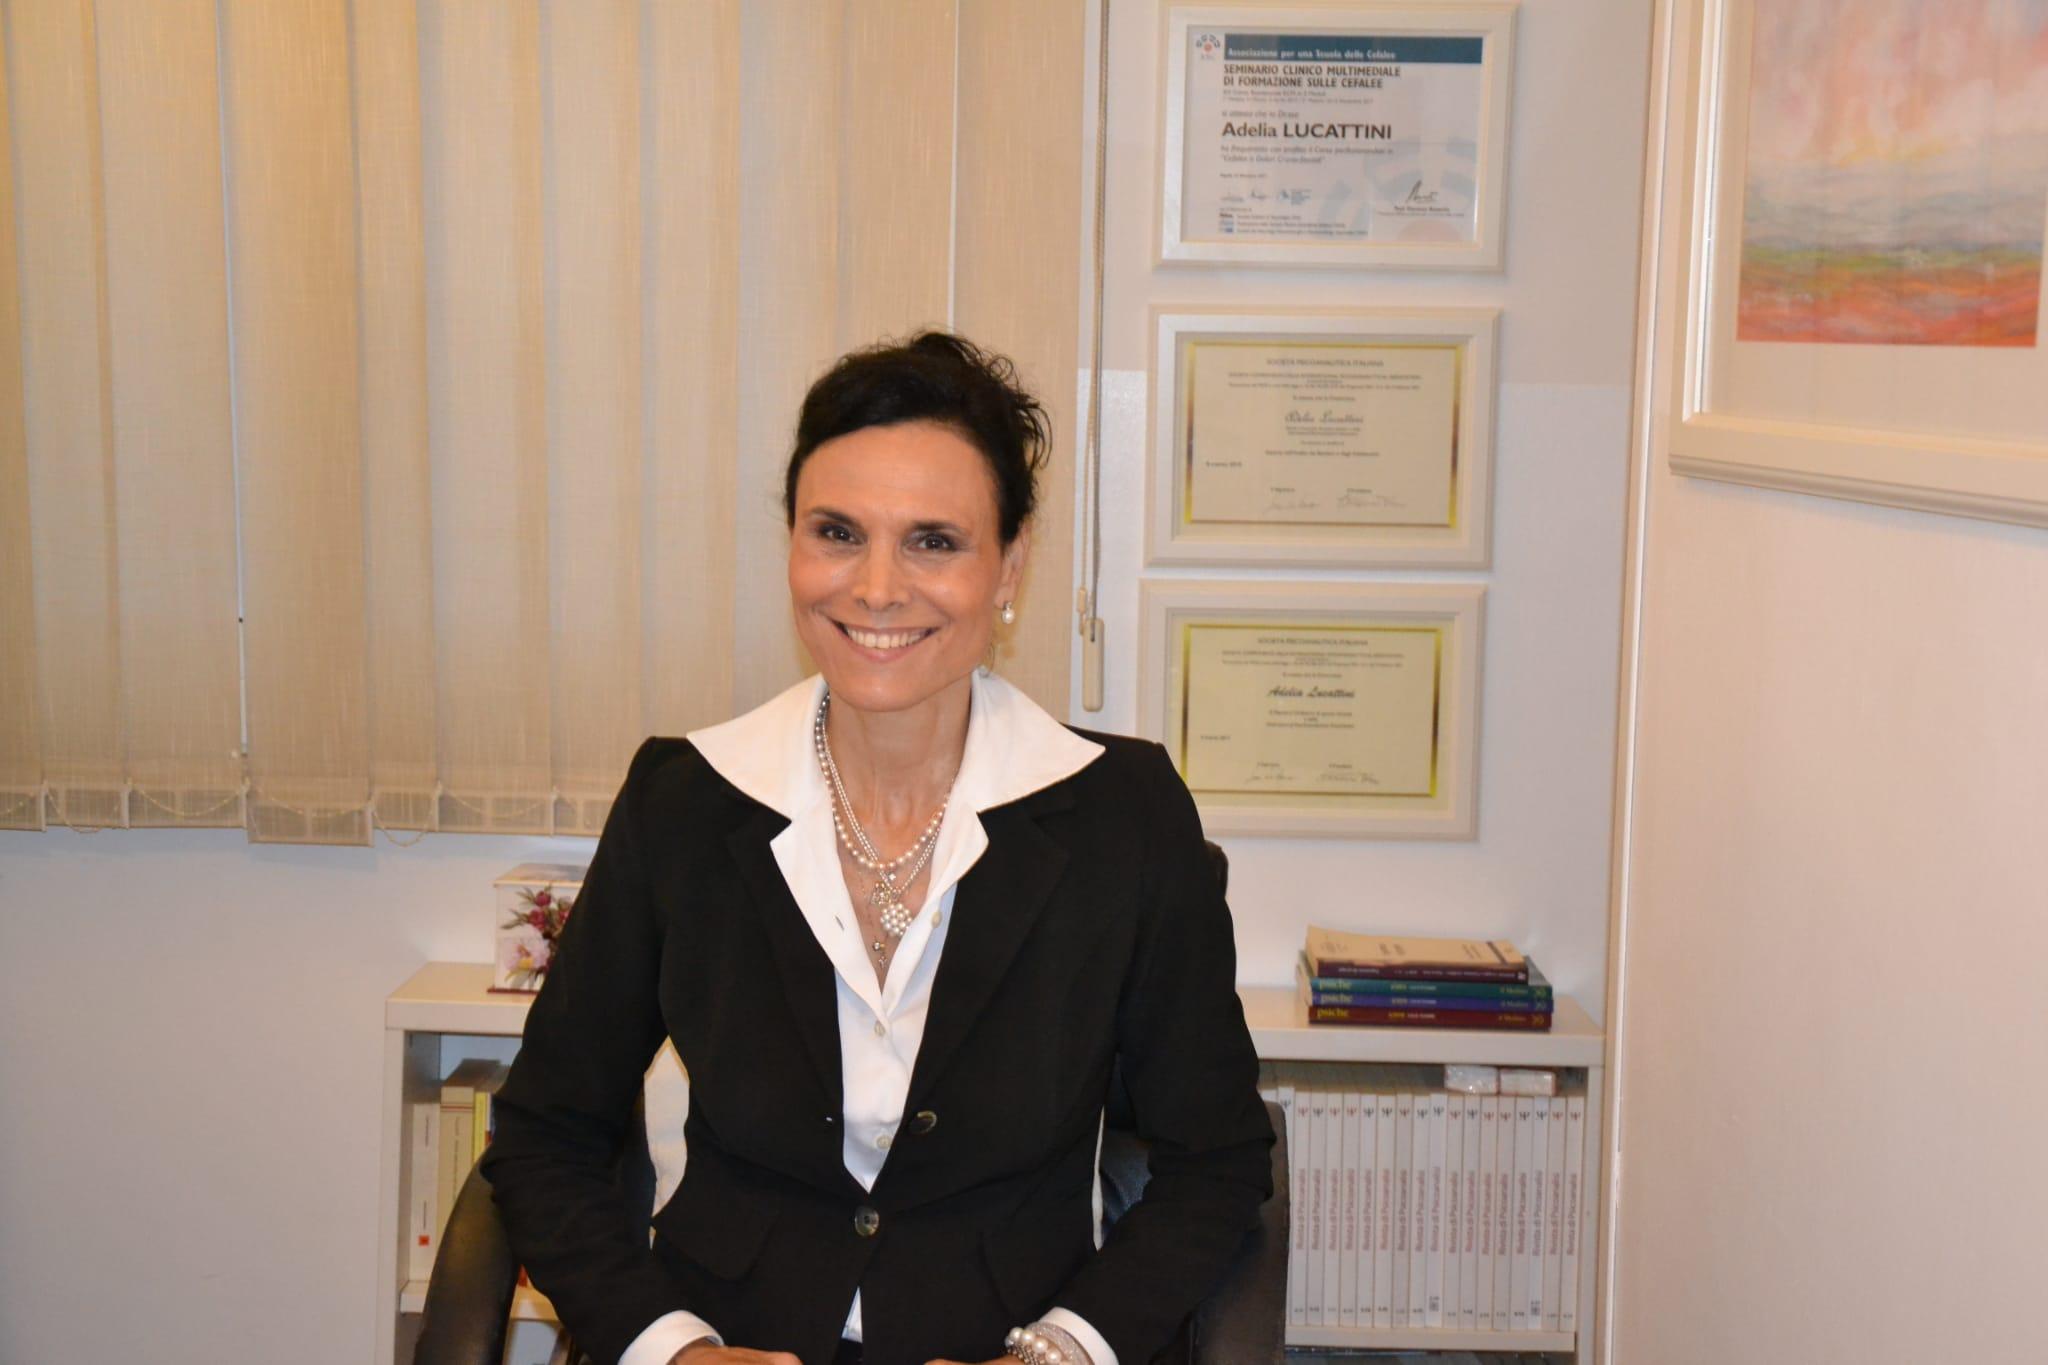 I DISTURBI PSICOLOGICI NEI BAMBINI: RICONOSCERLI, AFFRONTARLI                                                                                                                                                                                                                                                                 Intervista ad Adelia Lucattini